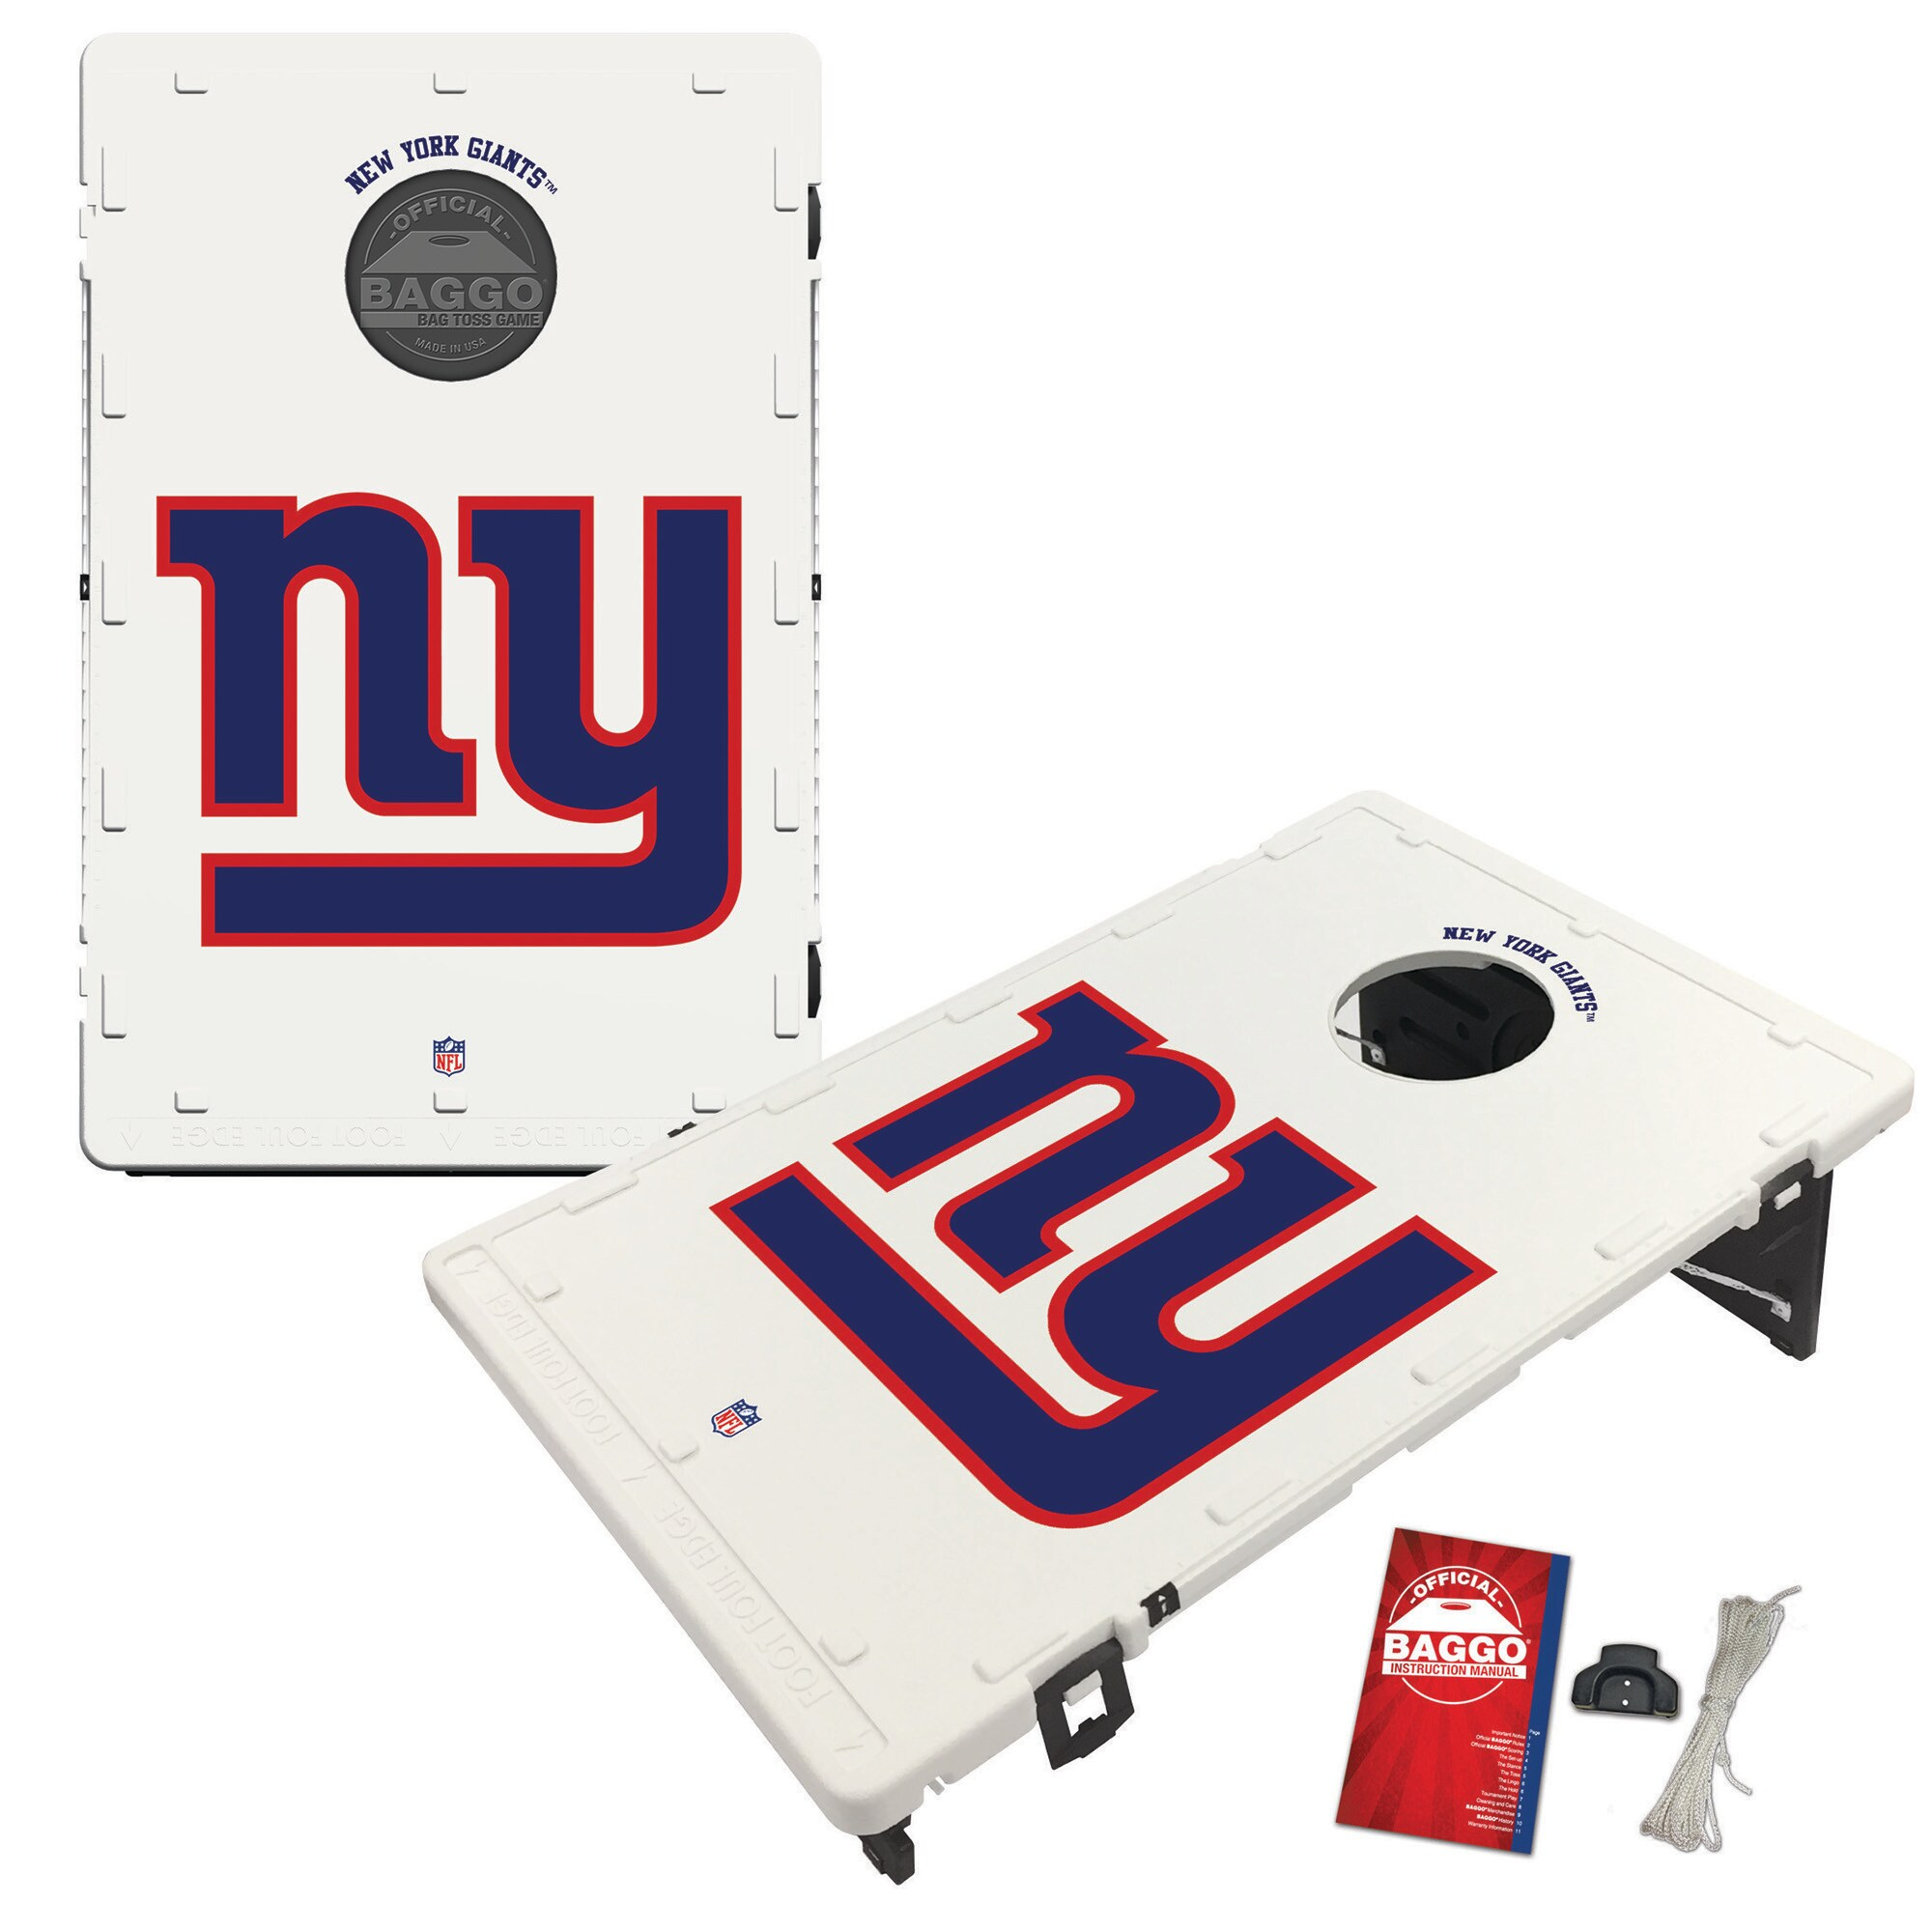 New York Giants 2' x 3' Classic Design BAGGO Cornhole Board Tailgate Toss Set